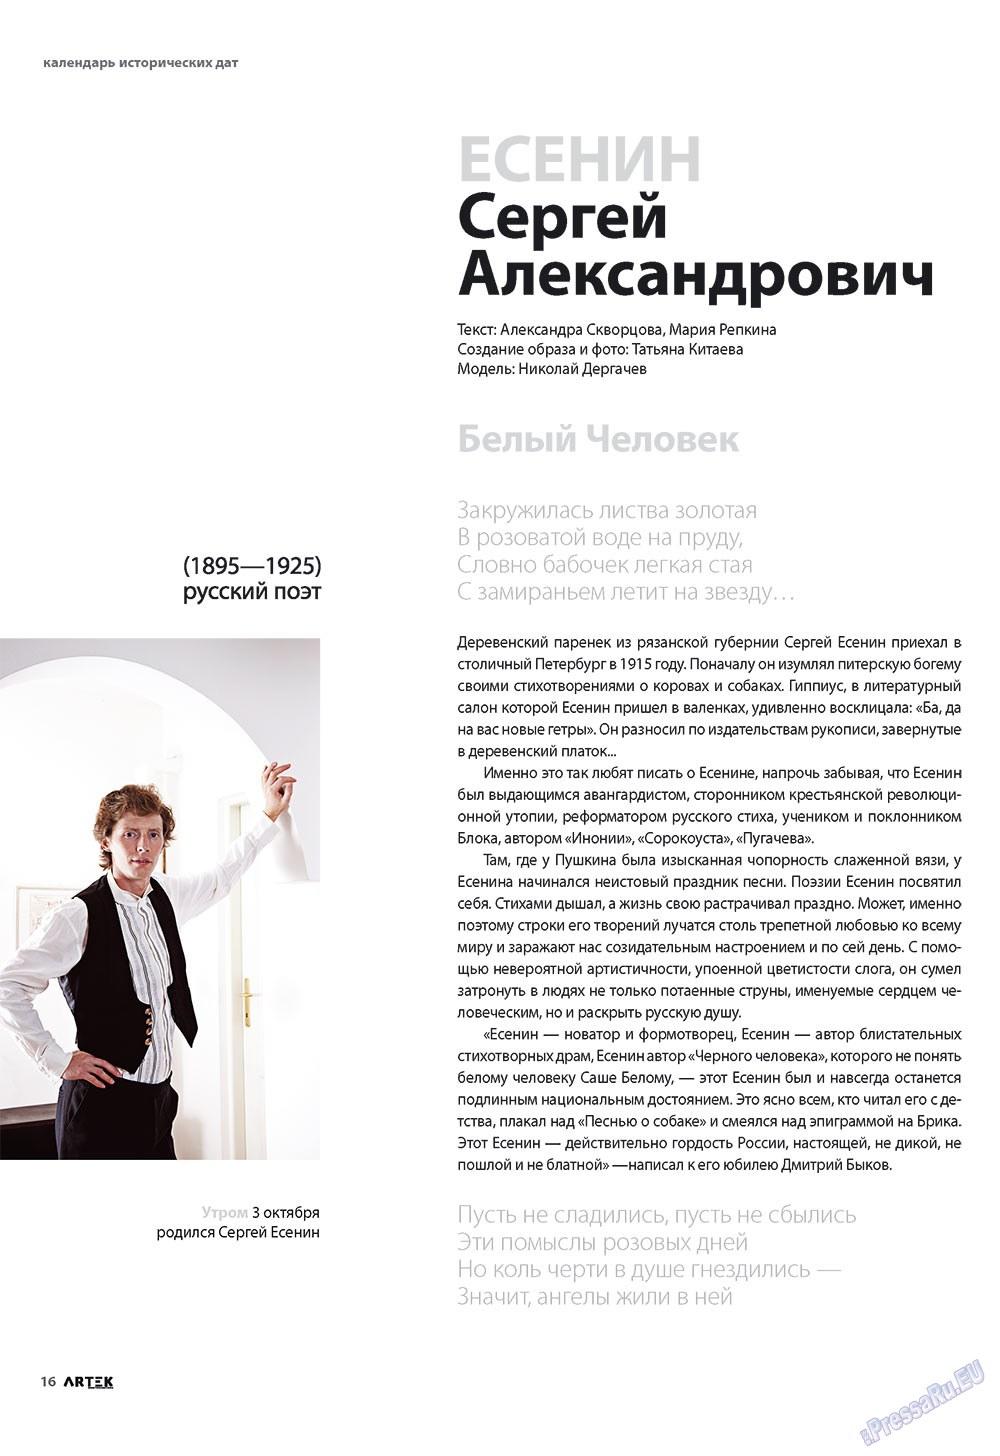 Артек (журнал). 2009 год, номер 4, стр. 16